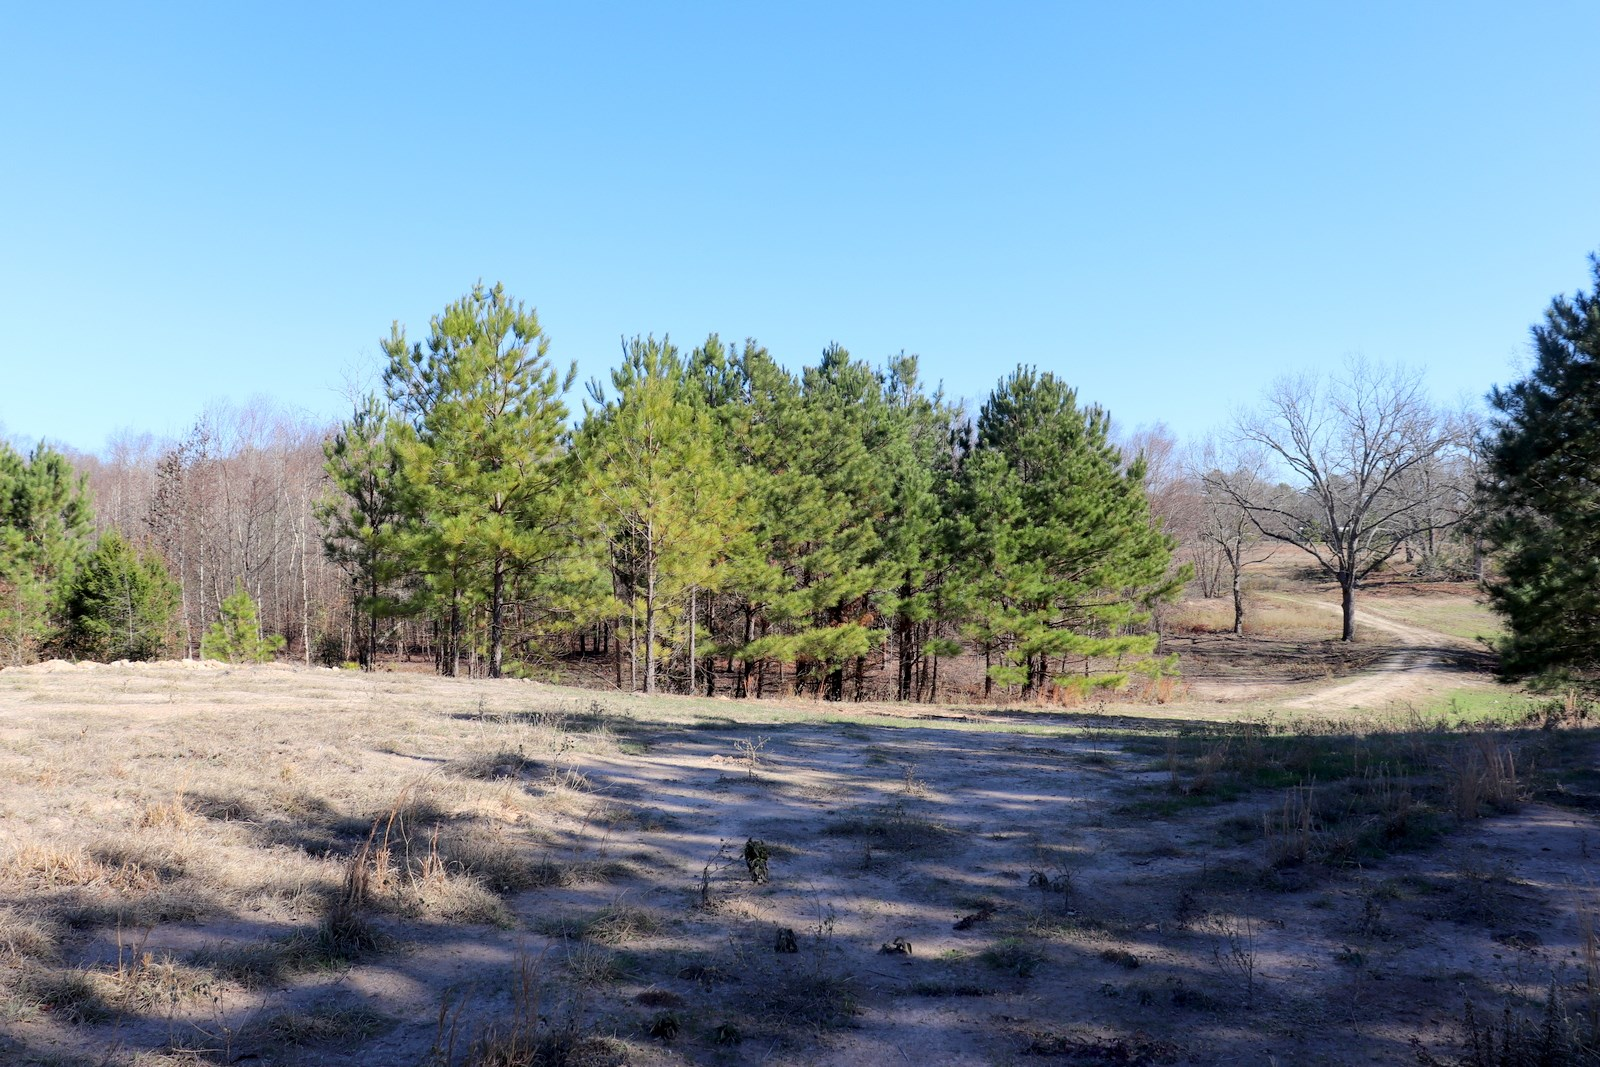 48 ACRES WOOD COUNTY - WINNSBORO, TX - 2 PONDS - SHOP